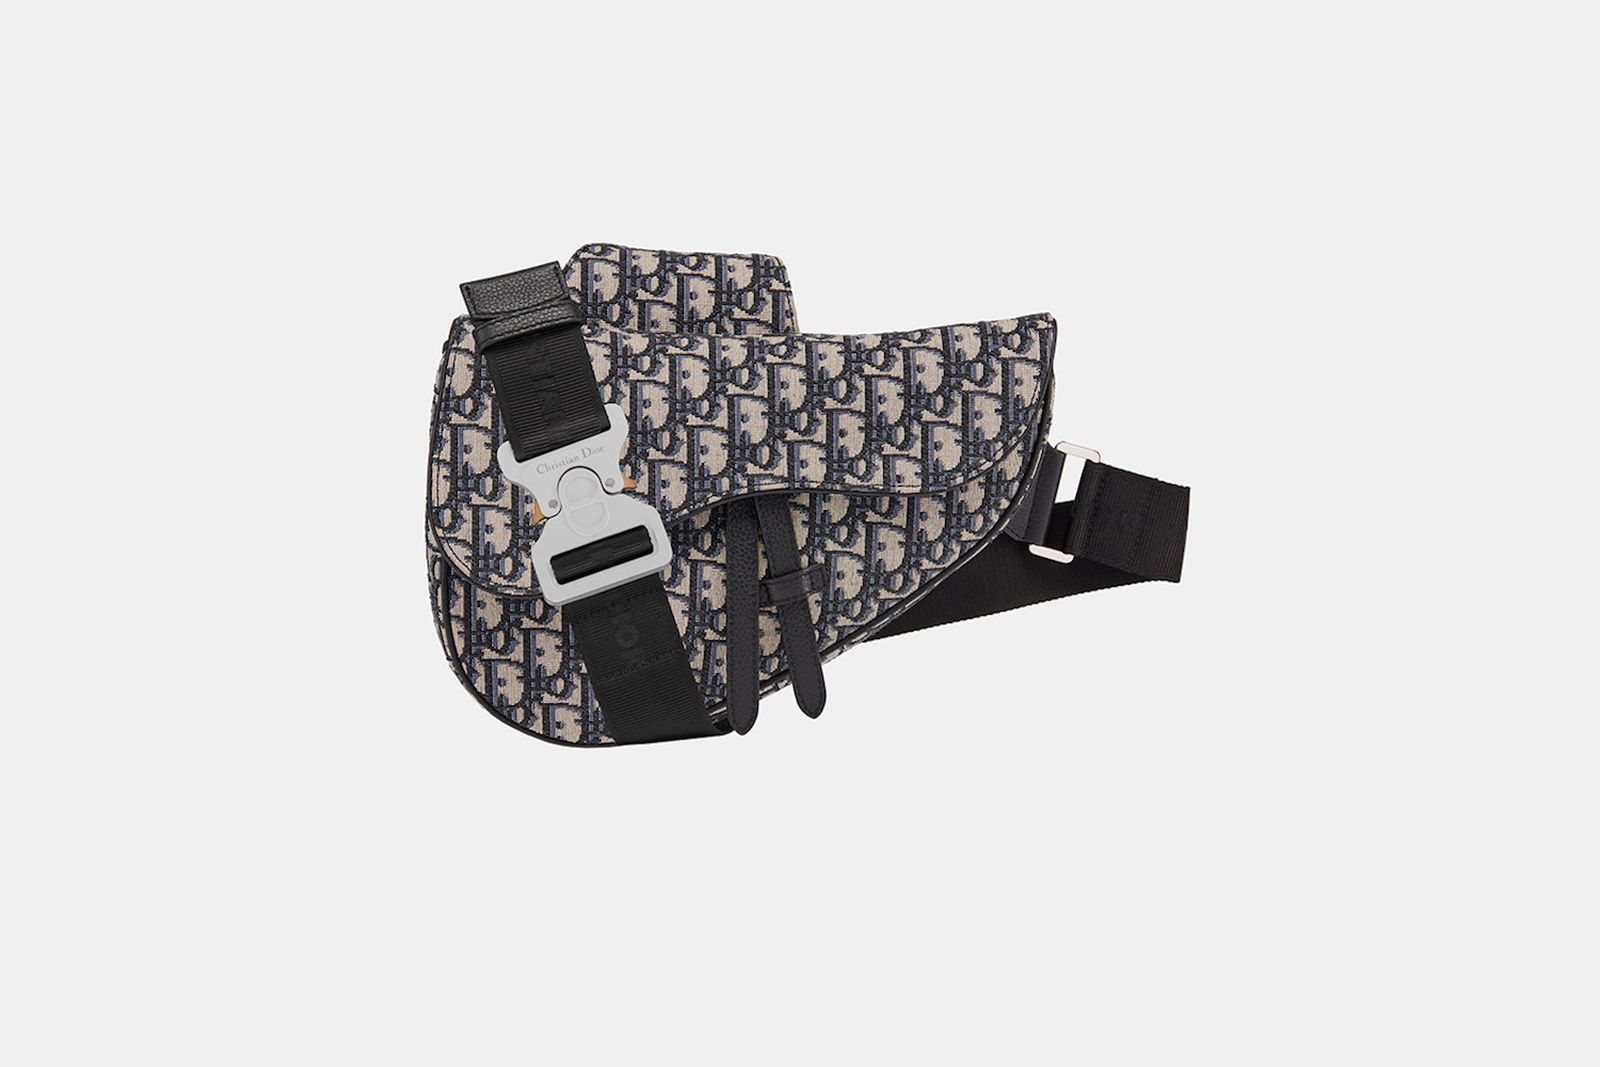 dior summer 2019 oblique accessories